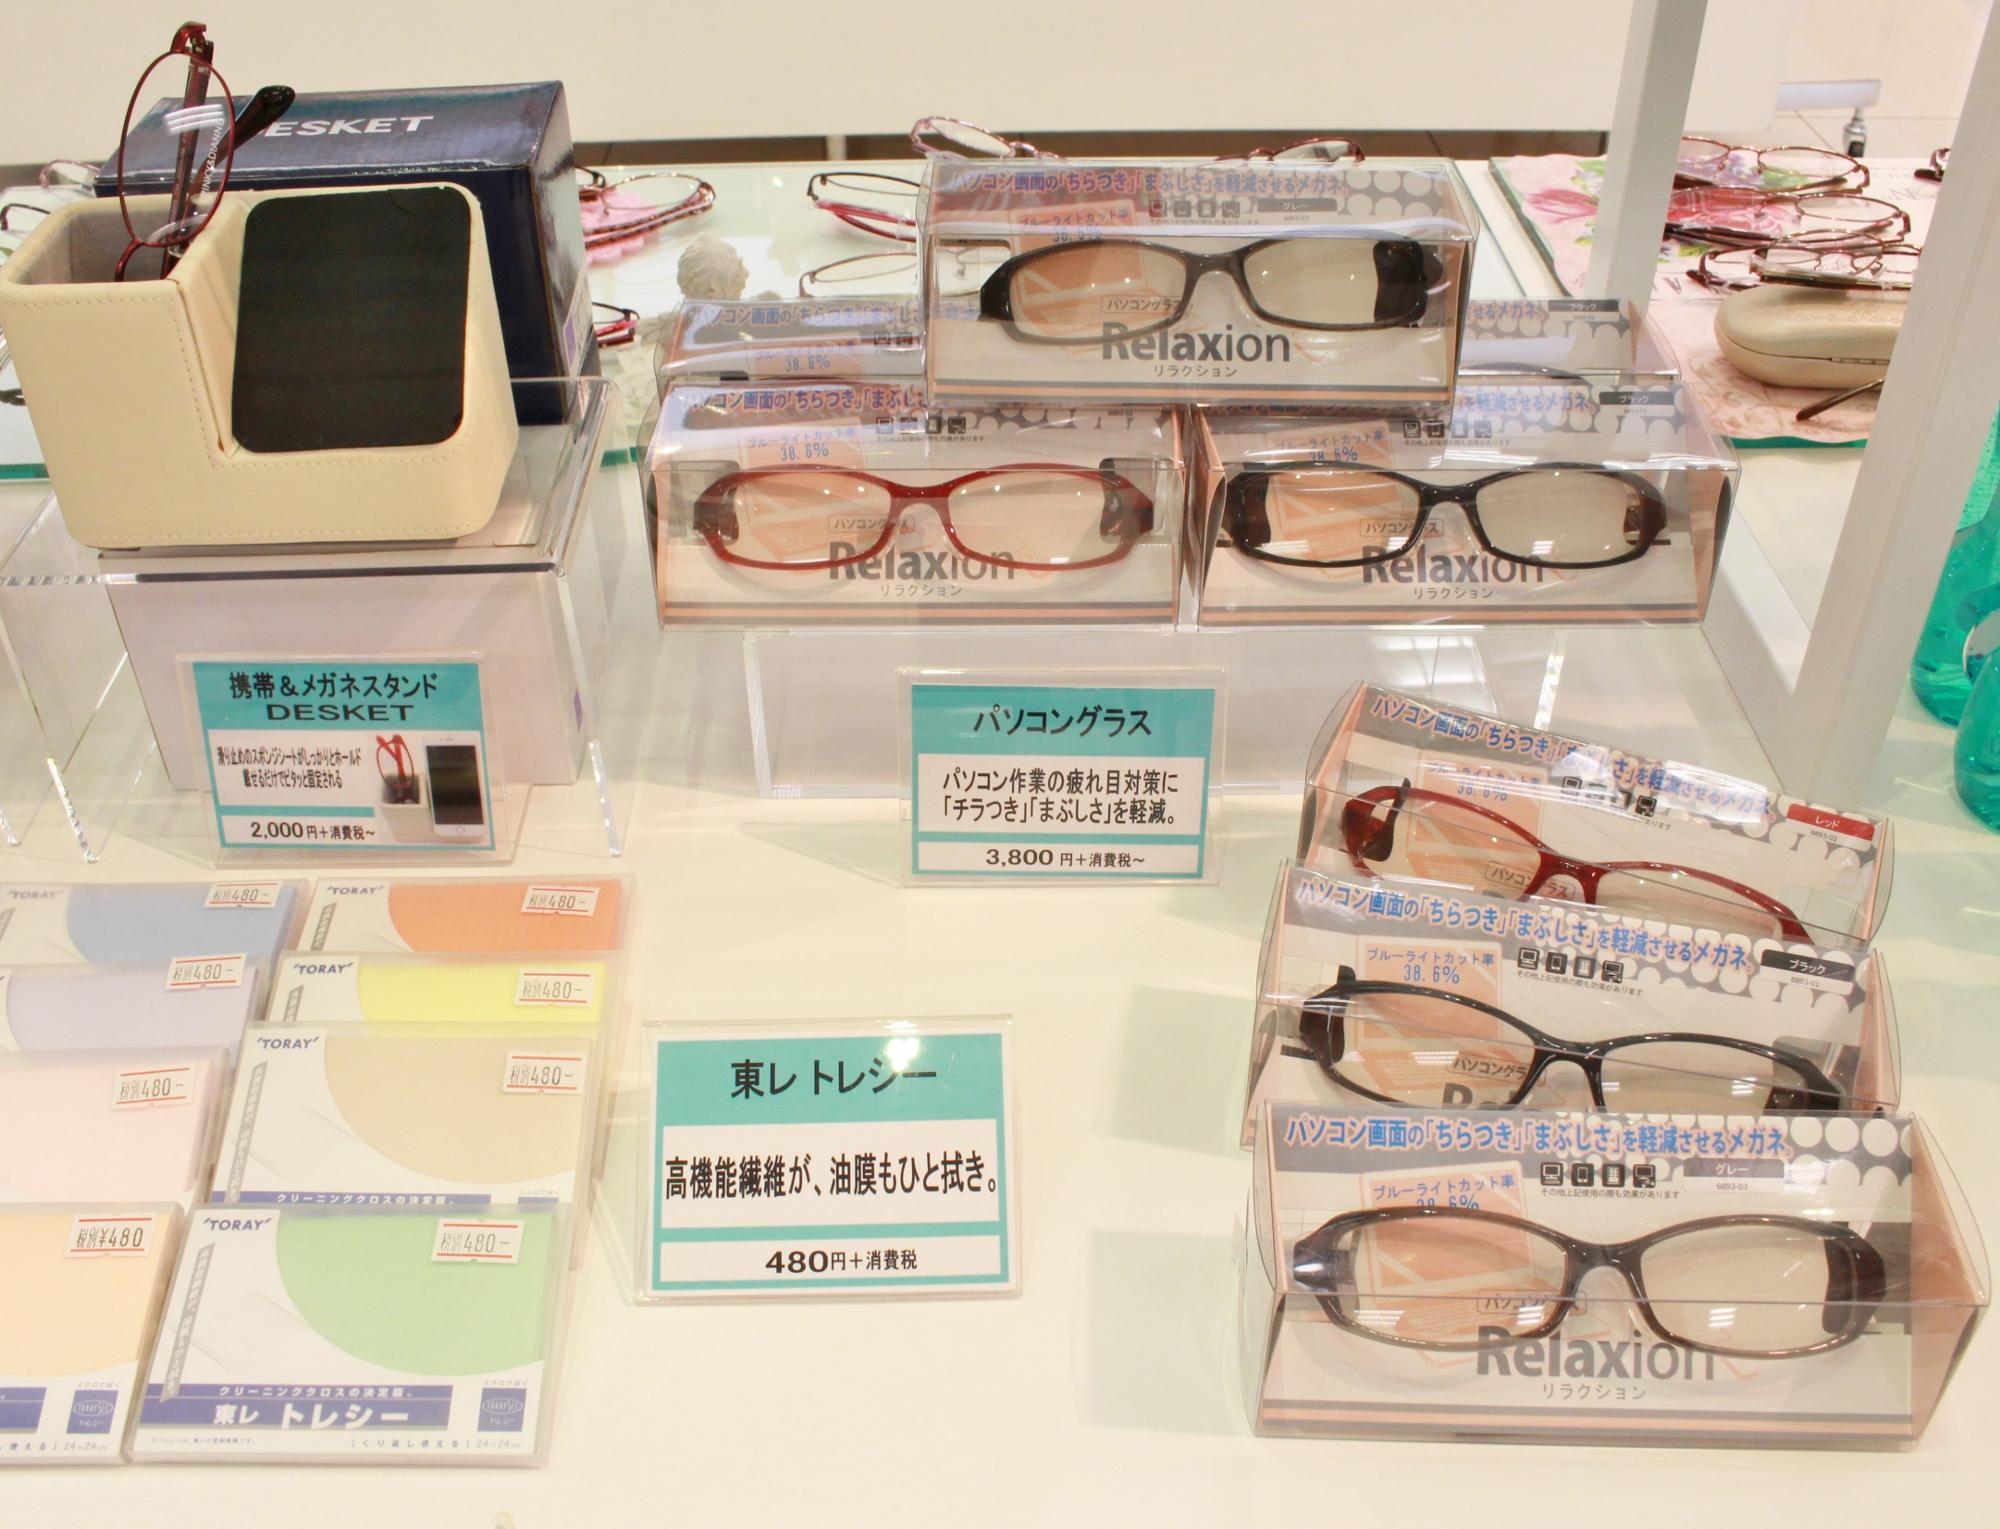 PC用メガネ リラクション ブルーライトカット 度無し 度付き 武蔵野市 メガネ フェイスオン 武蔵境